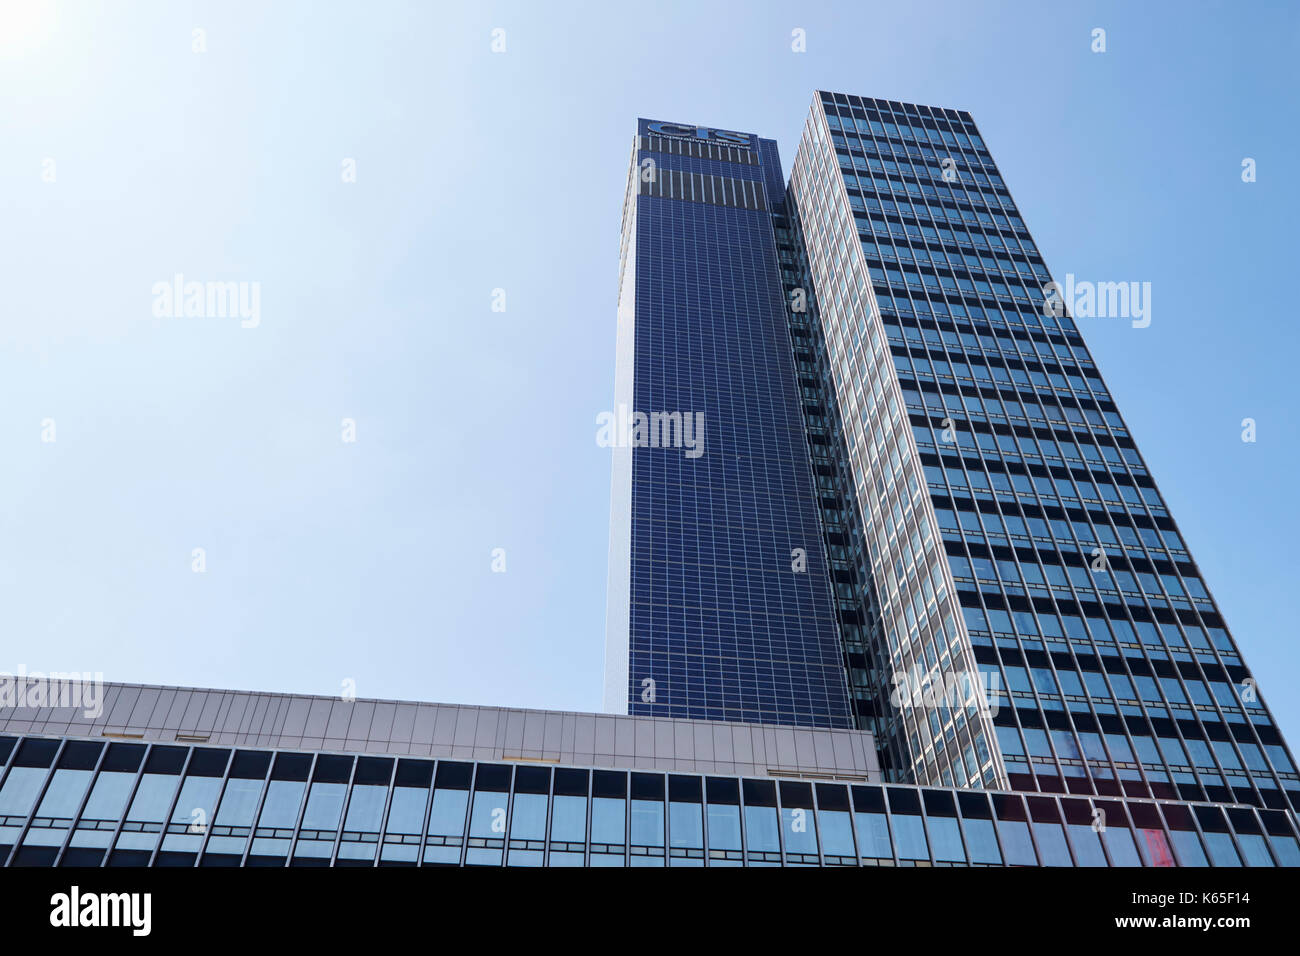 Cis Tower Stock Photos Amp Cis Tower Stock Images Alamy